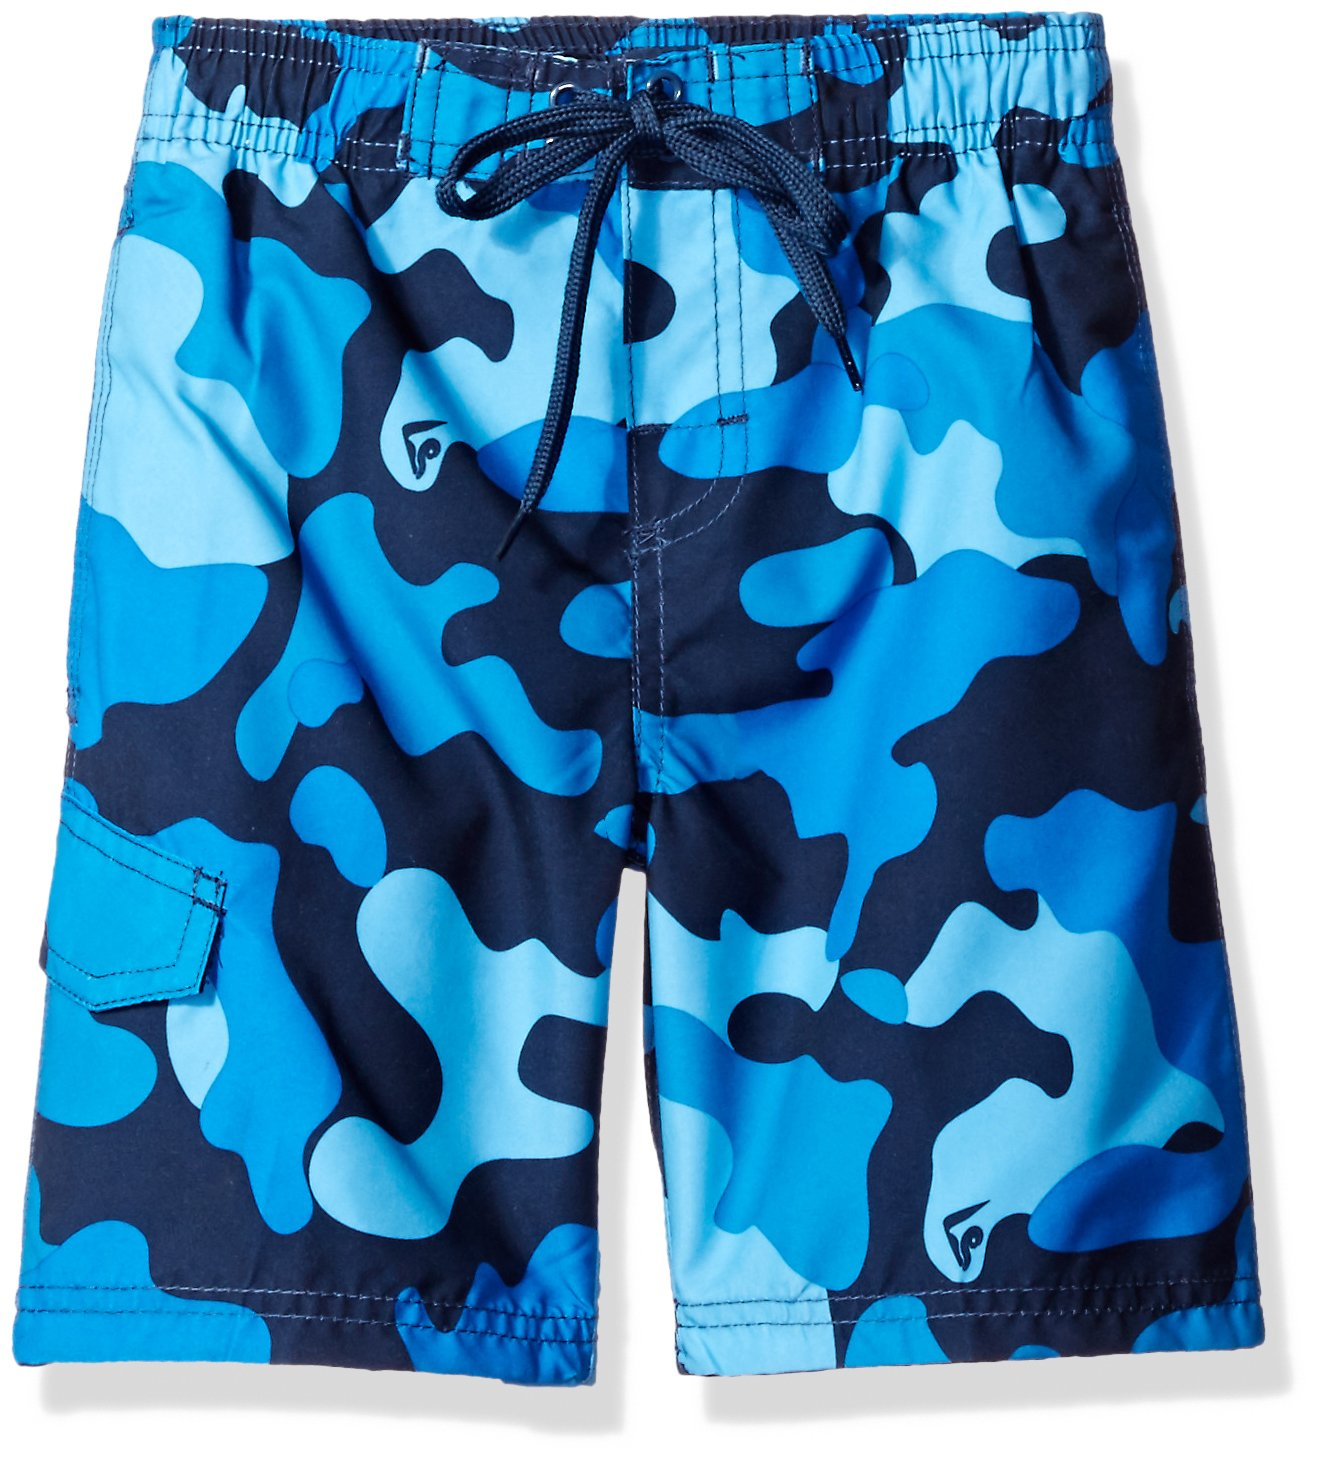 9754a13f76 Best Rated in Boys' Swimwear & Helpful Customer Reviews - Amazon.com